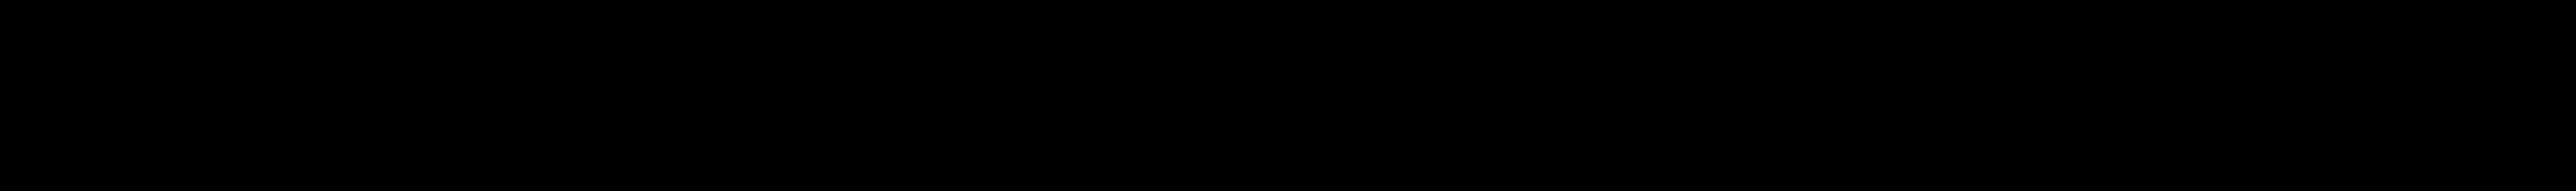 YWFT OverCross Extra Light